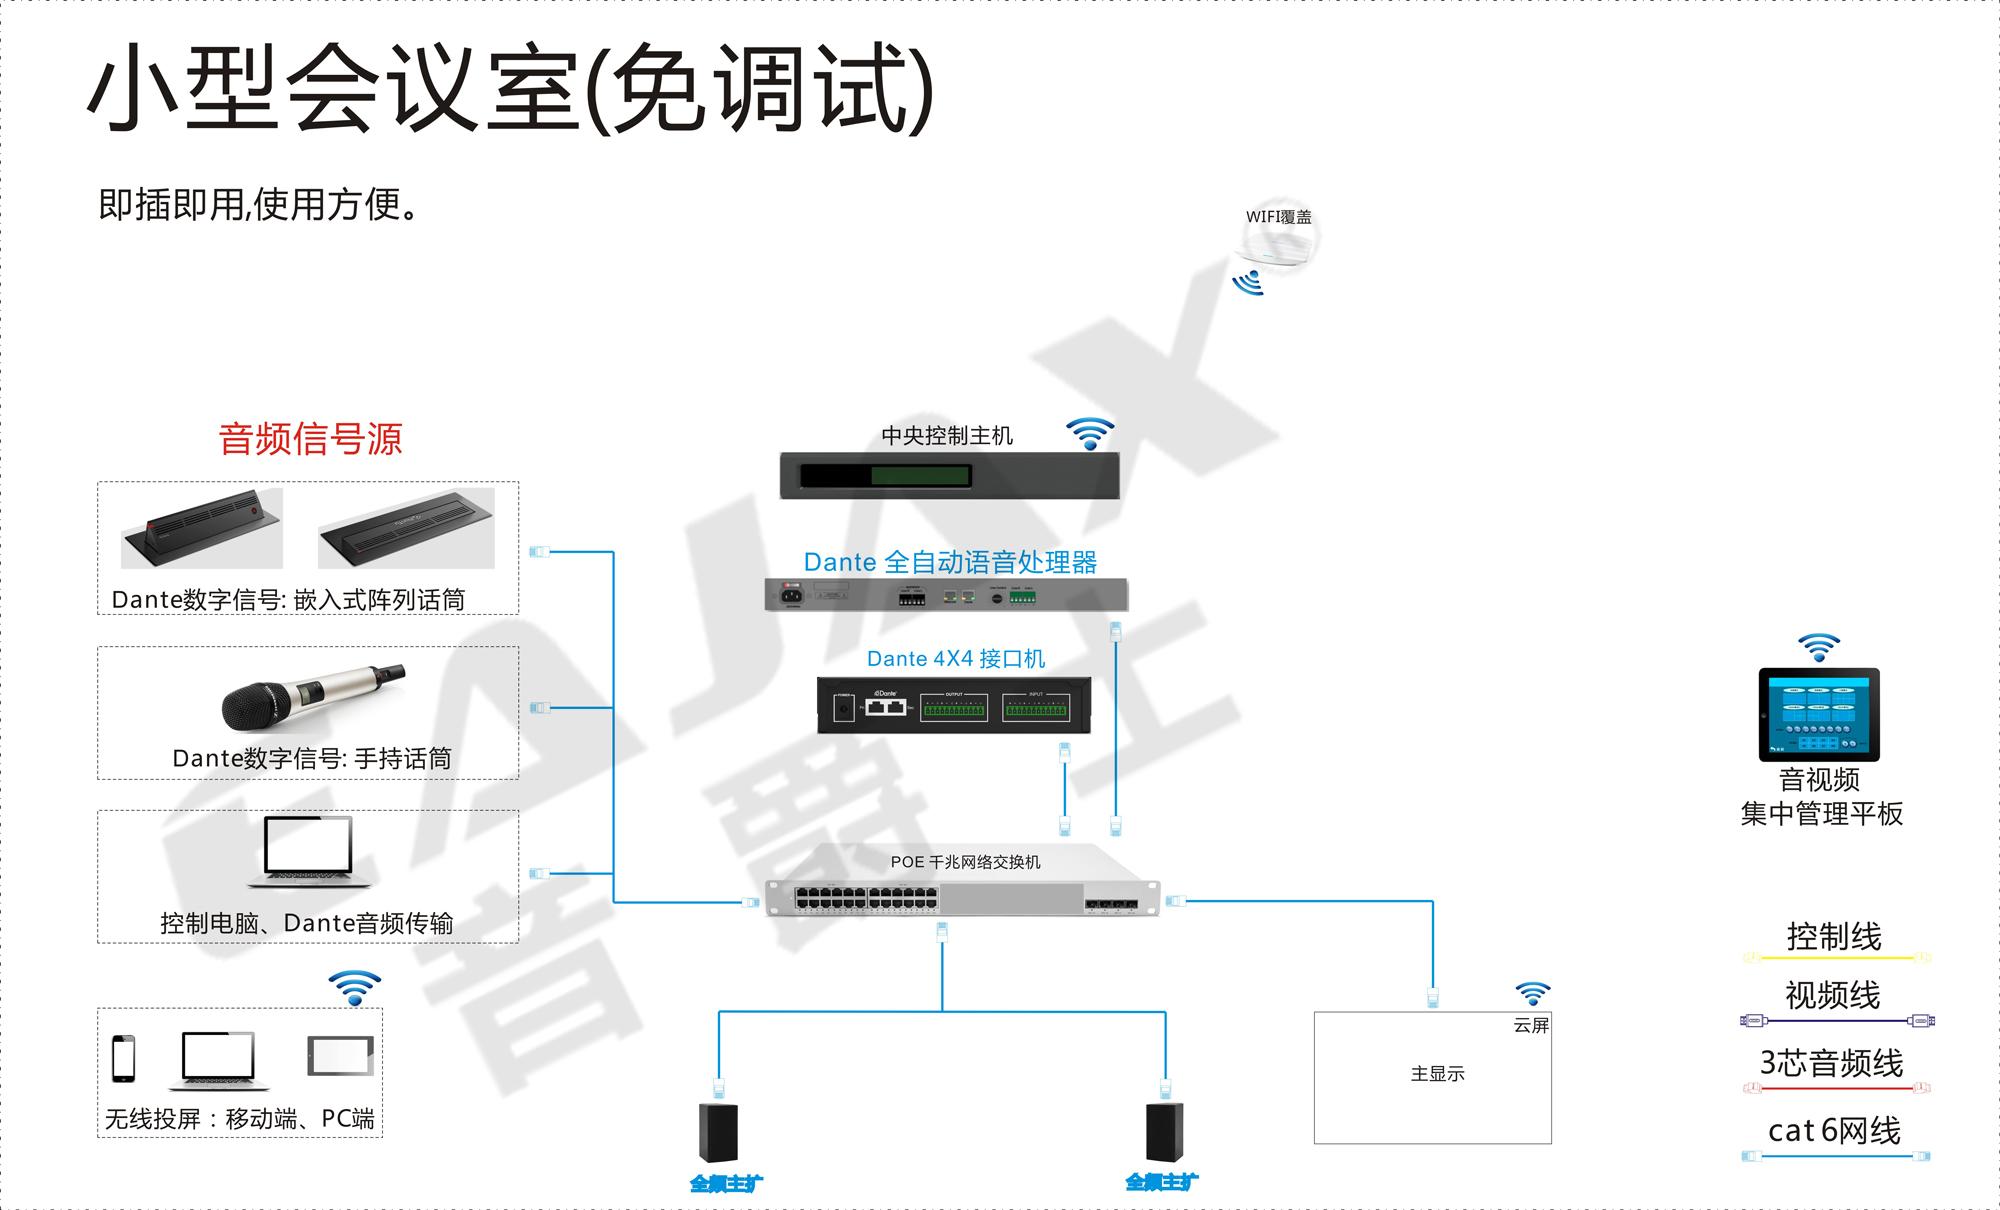 dante系统,完结版-网线版1小型会议室.jpg